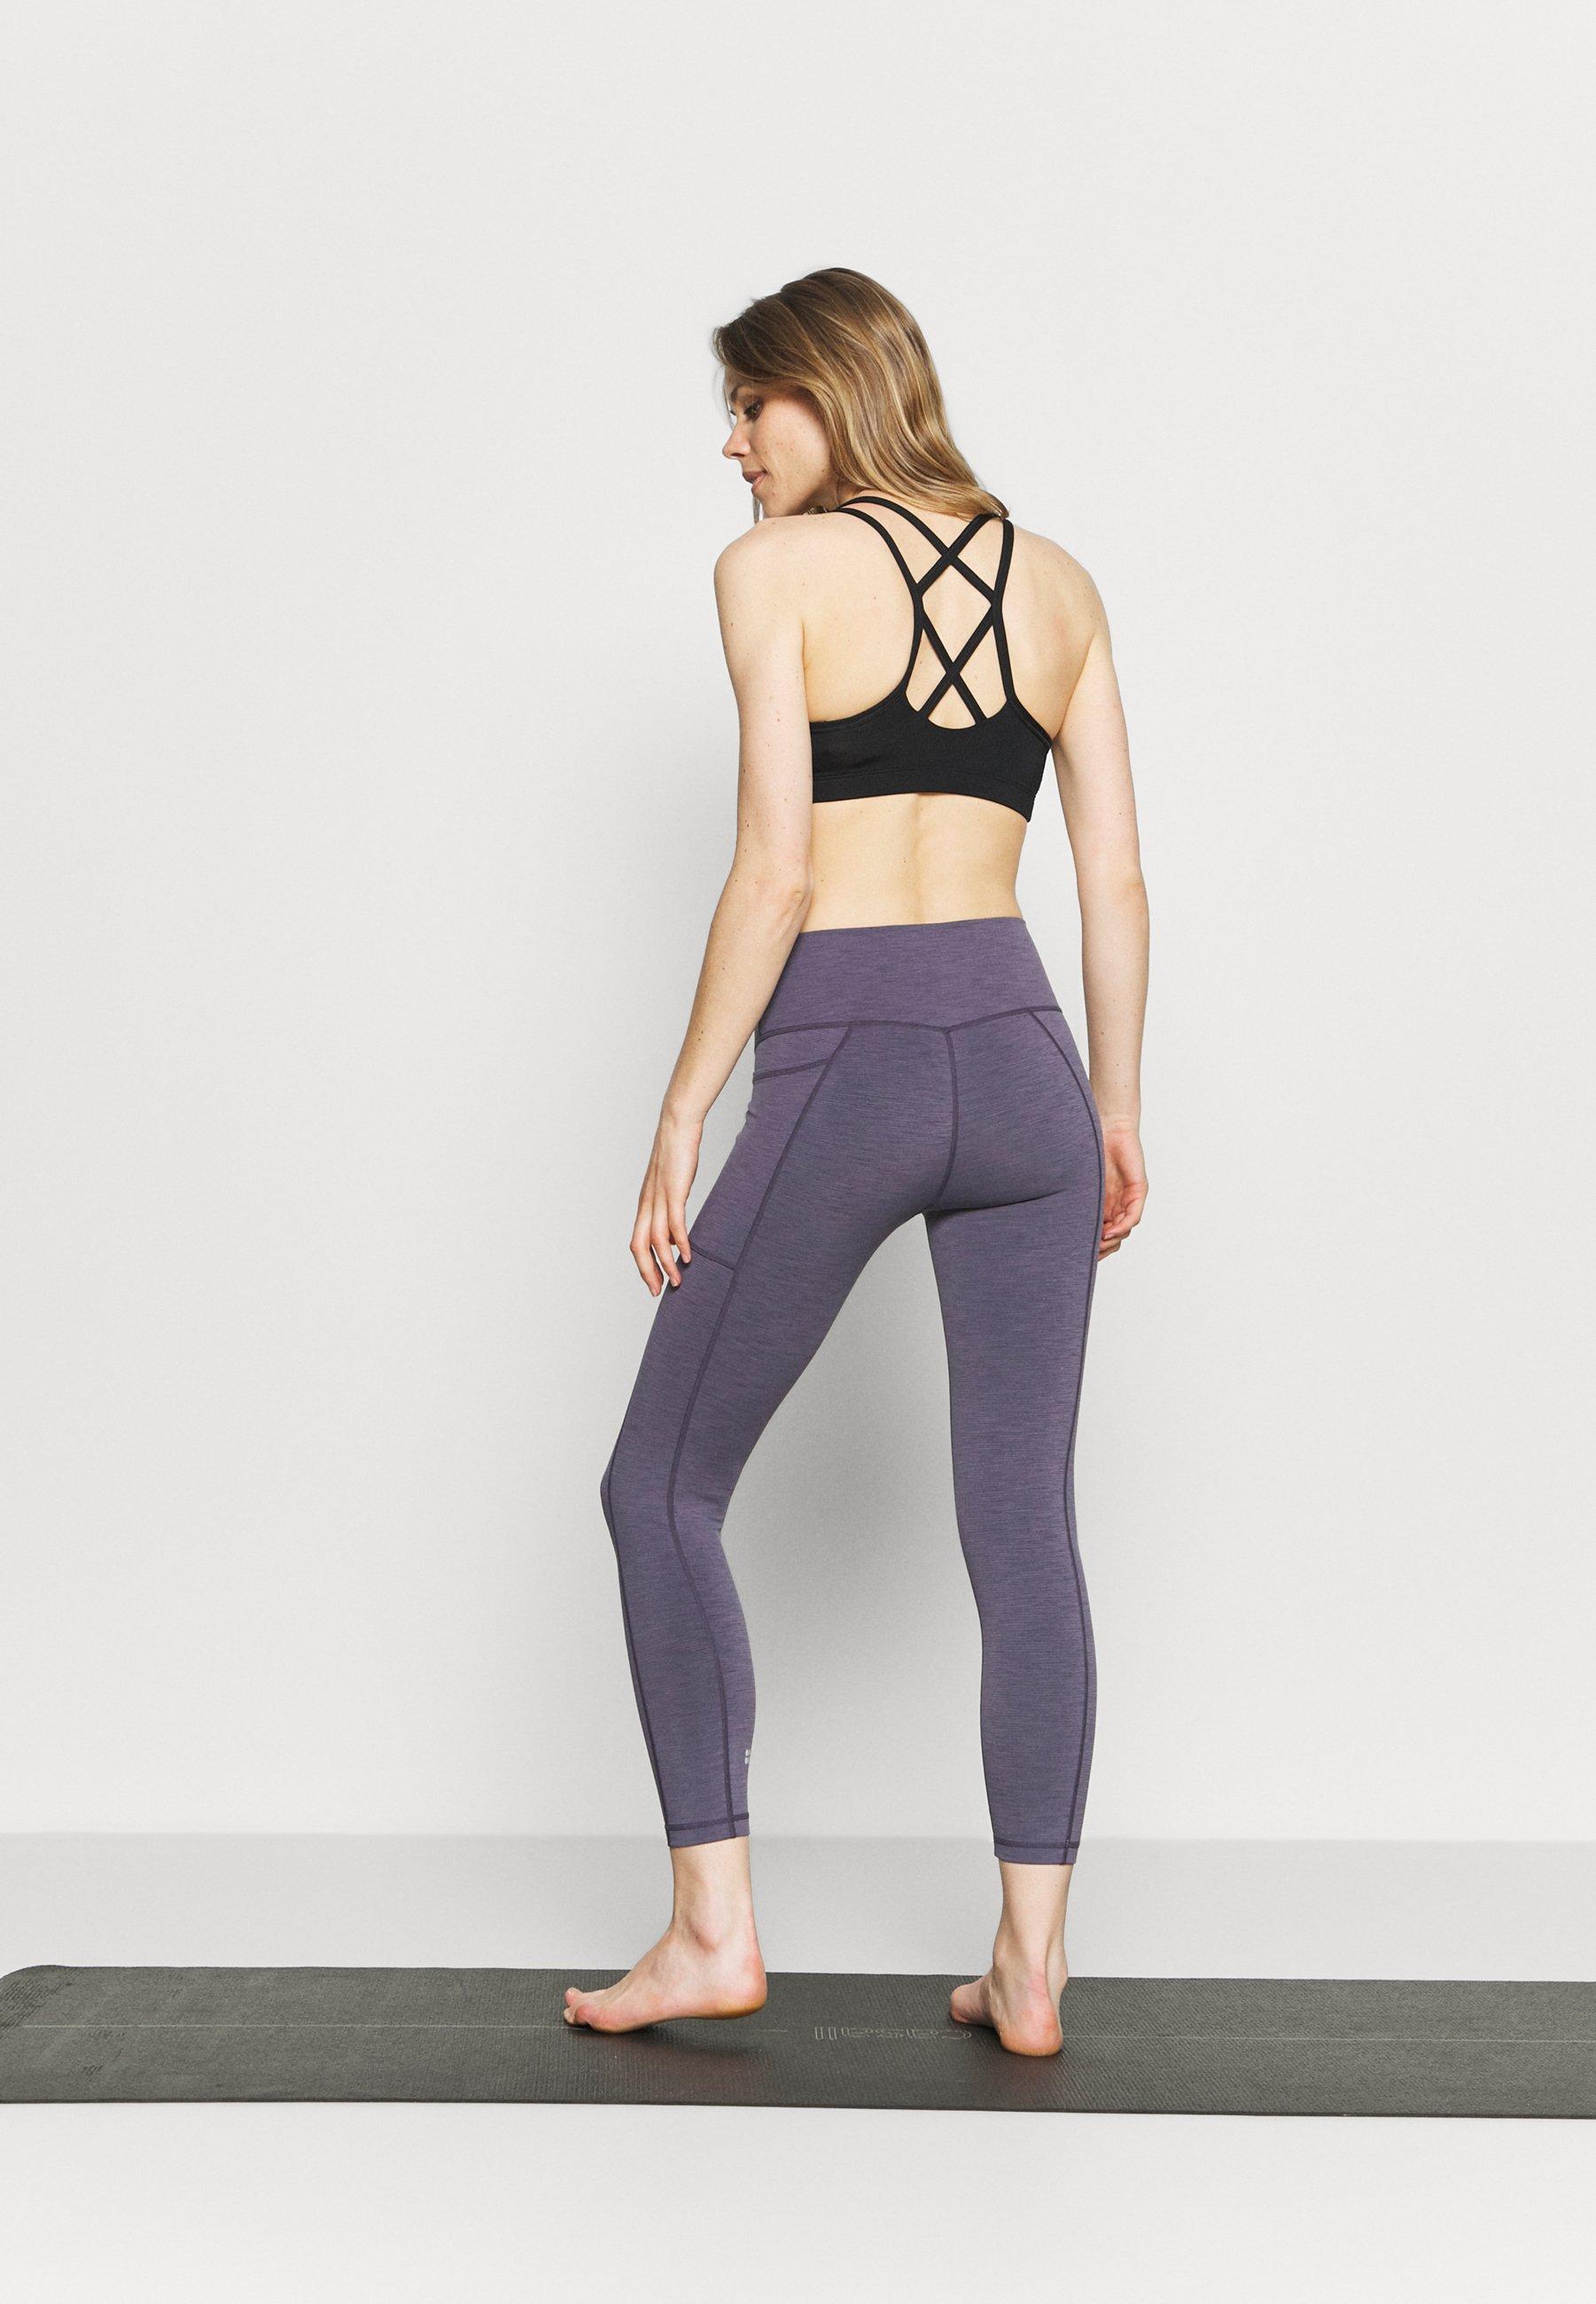 Femme SUPER SCULPT 7/8 YOGA LEGGINGS - Collants